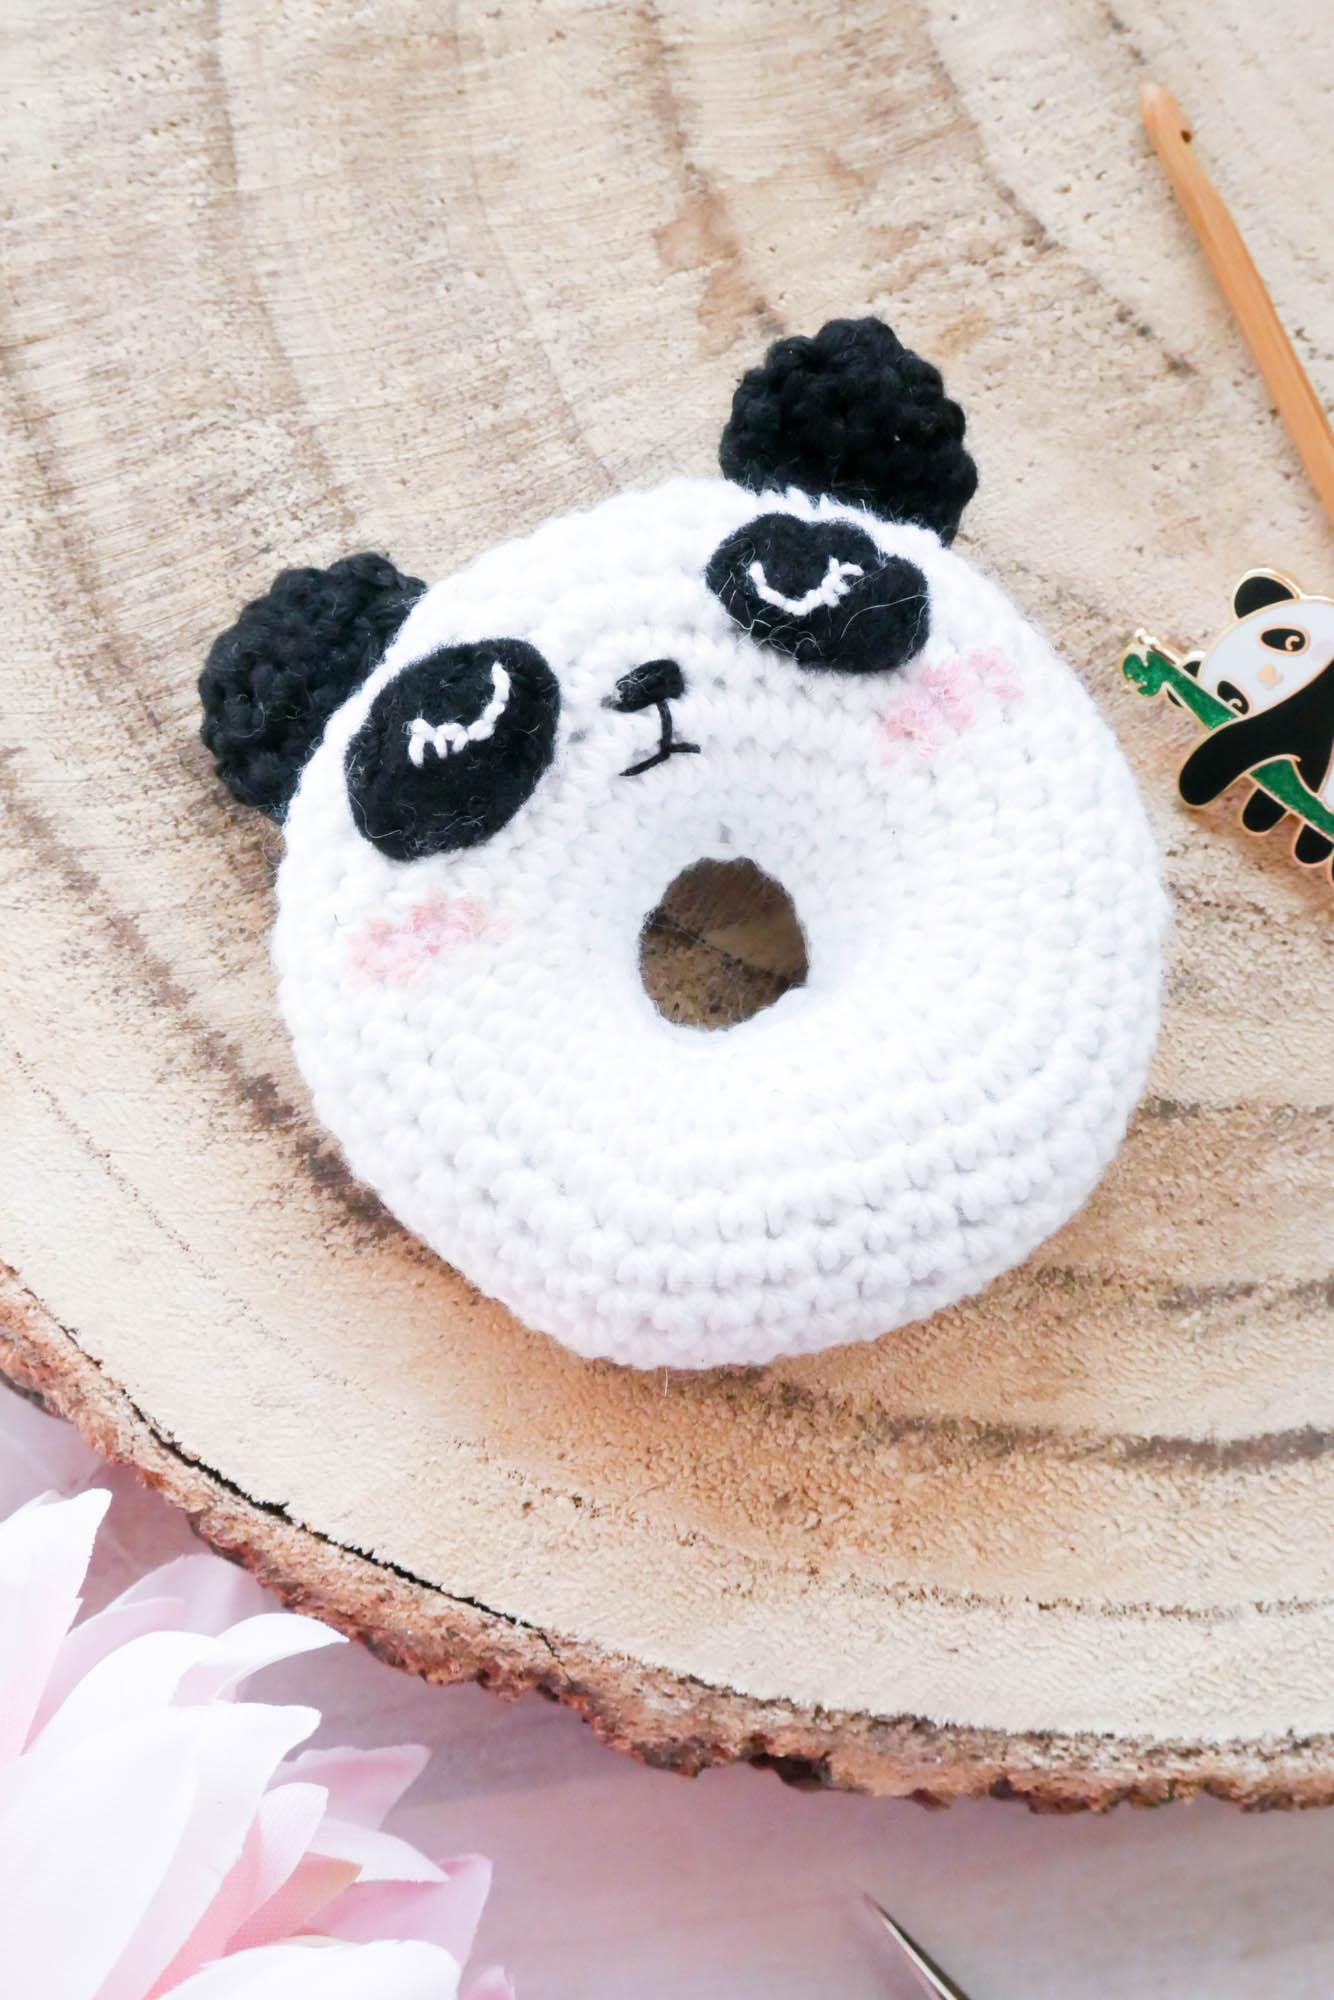 Panda Amigurumi Häkelanleitung von Little Bear Crochets | 2000x1334